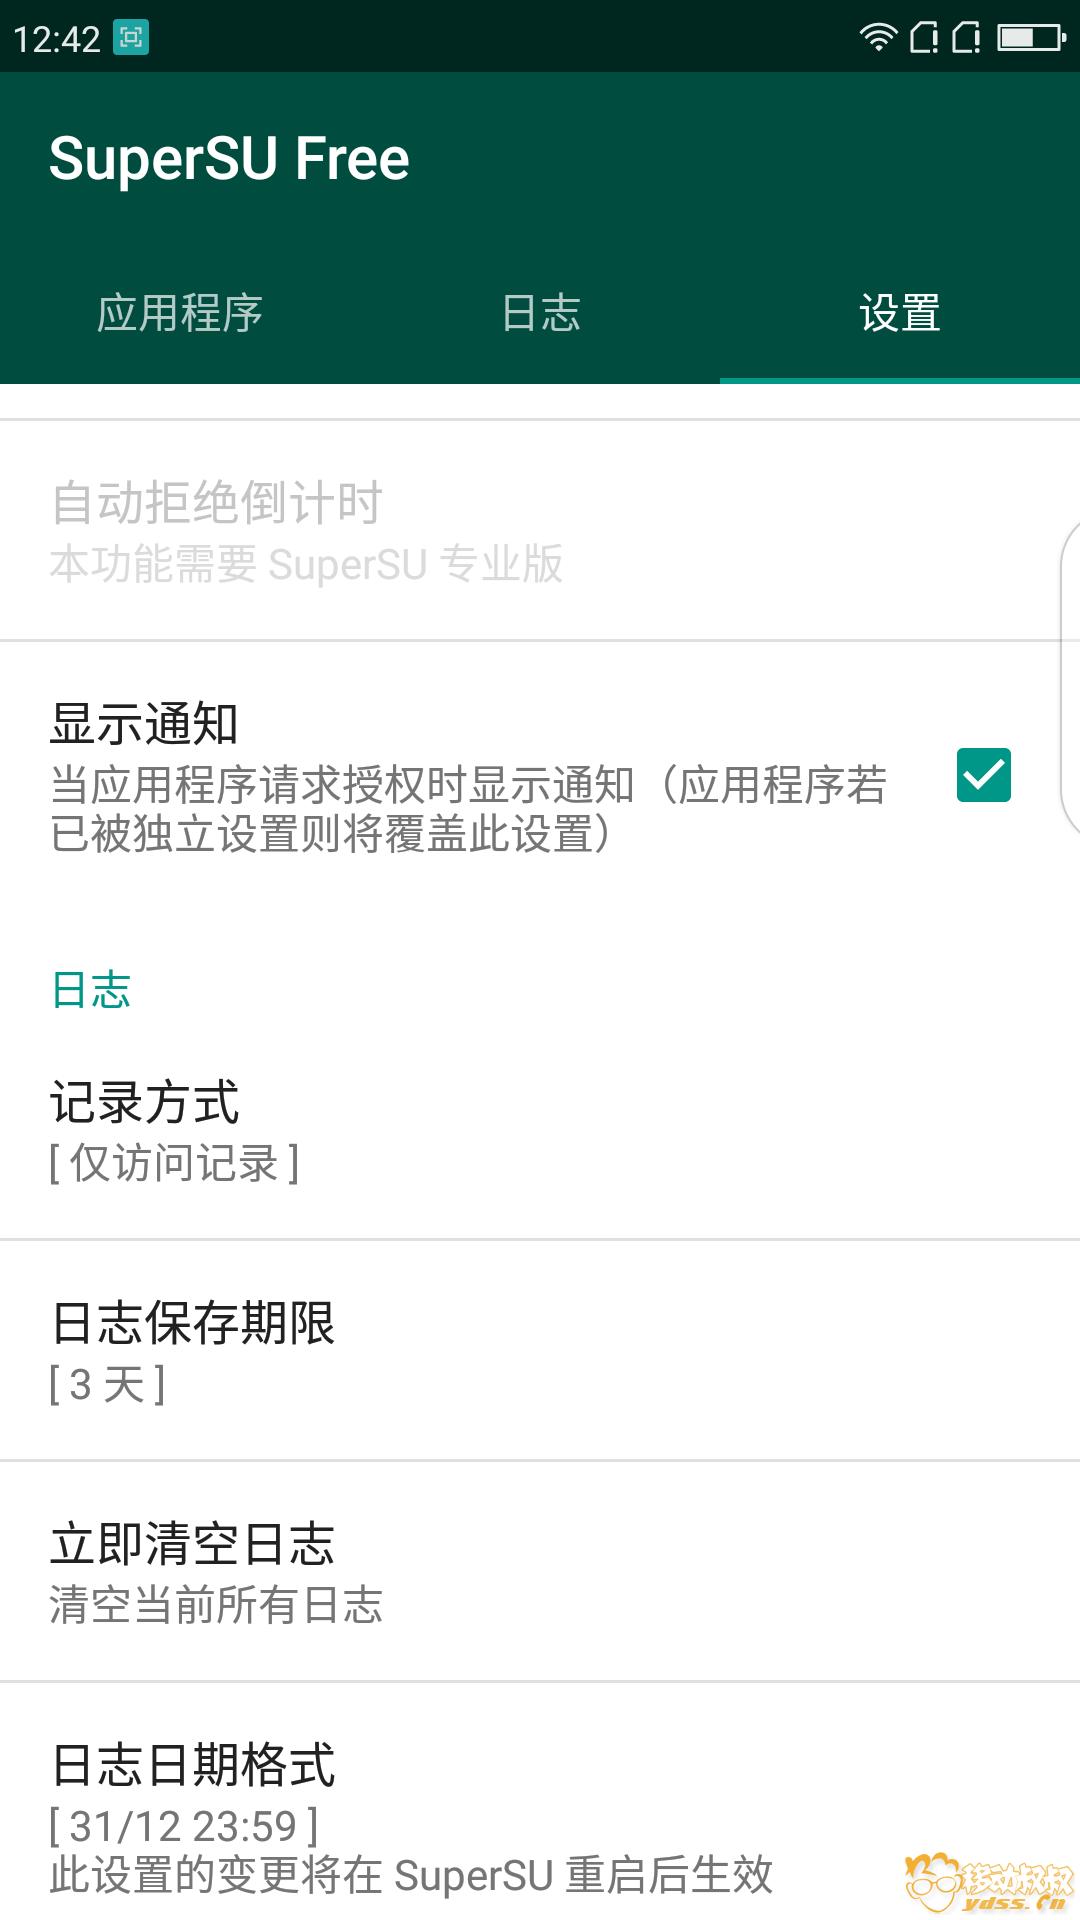 Screenshot_2018-09-19-12-42-36.png